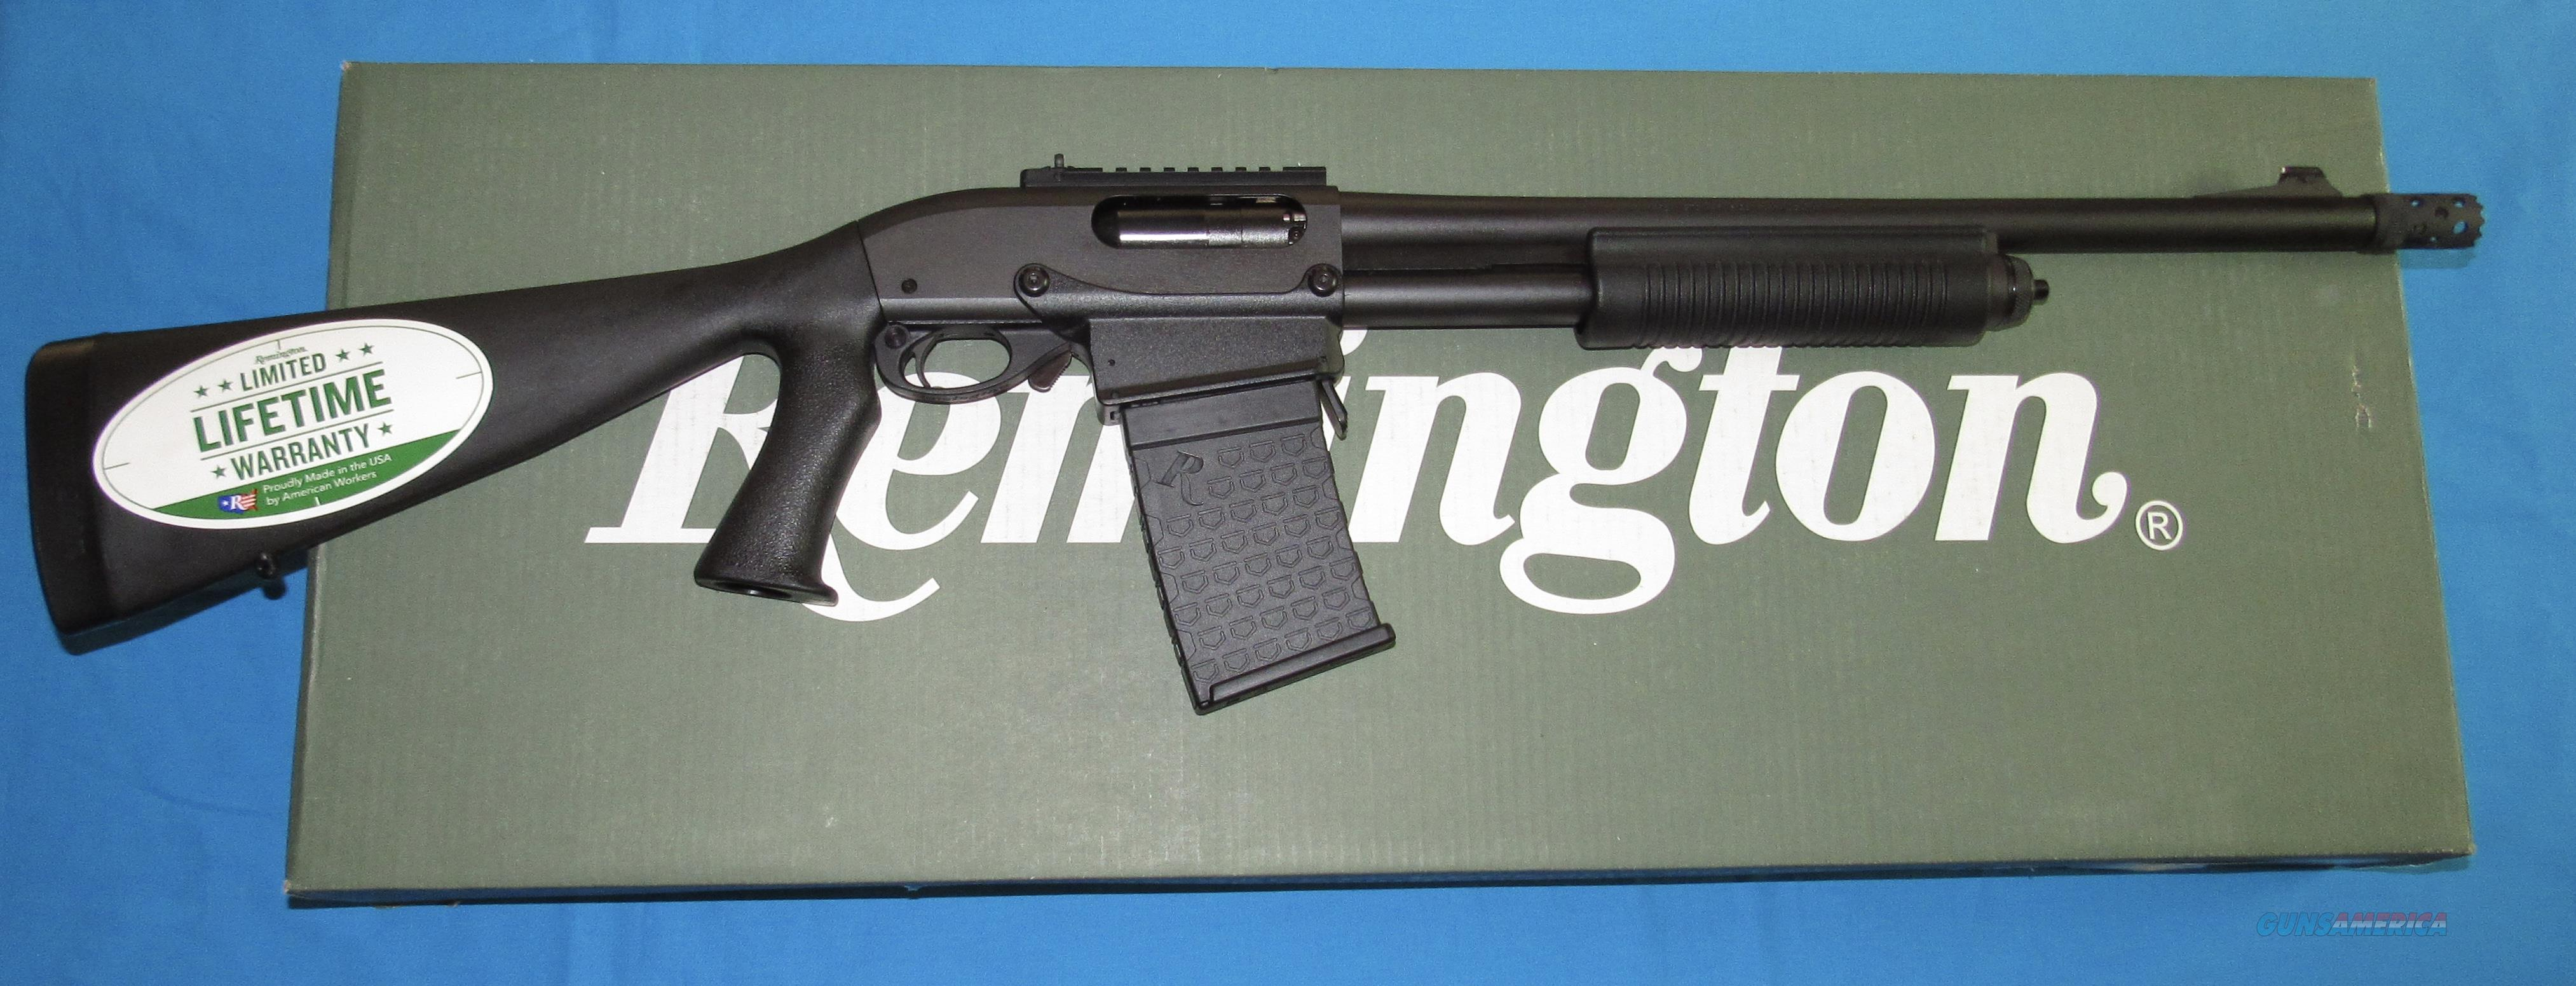 REMINGTON 870 EXPRESS TACTICAL 12 GAUGE PUMP SHOTGUN W/DETACHABLE MAGAZINE  Guns > Shotguns > Remington Shotguns  > Pump > Tactical